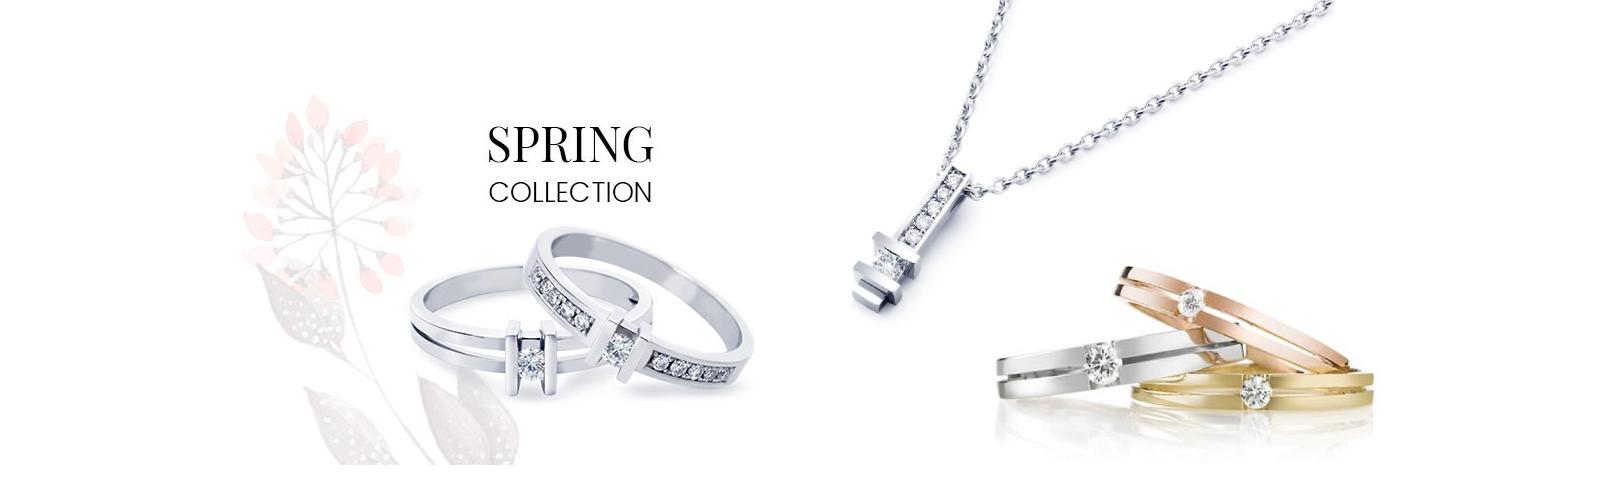 R&C groeibriljant briljant sieraden spring Wolters Juweliers Coevorden Emmen Hoogeveen Hardenberg